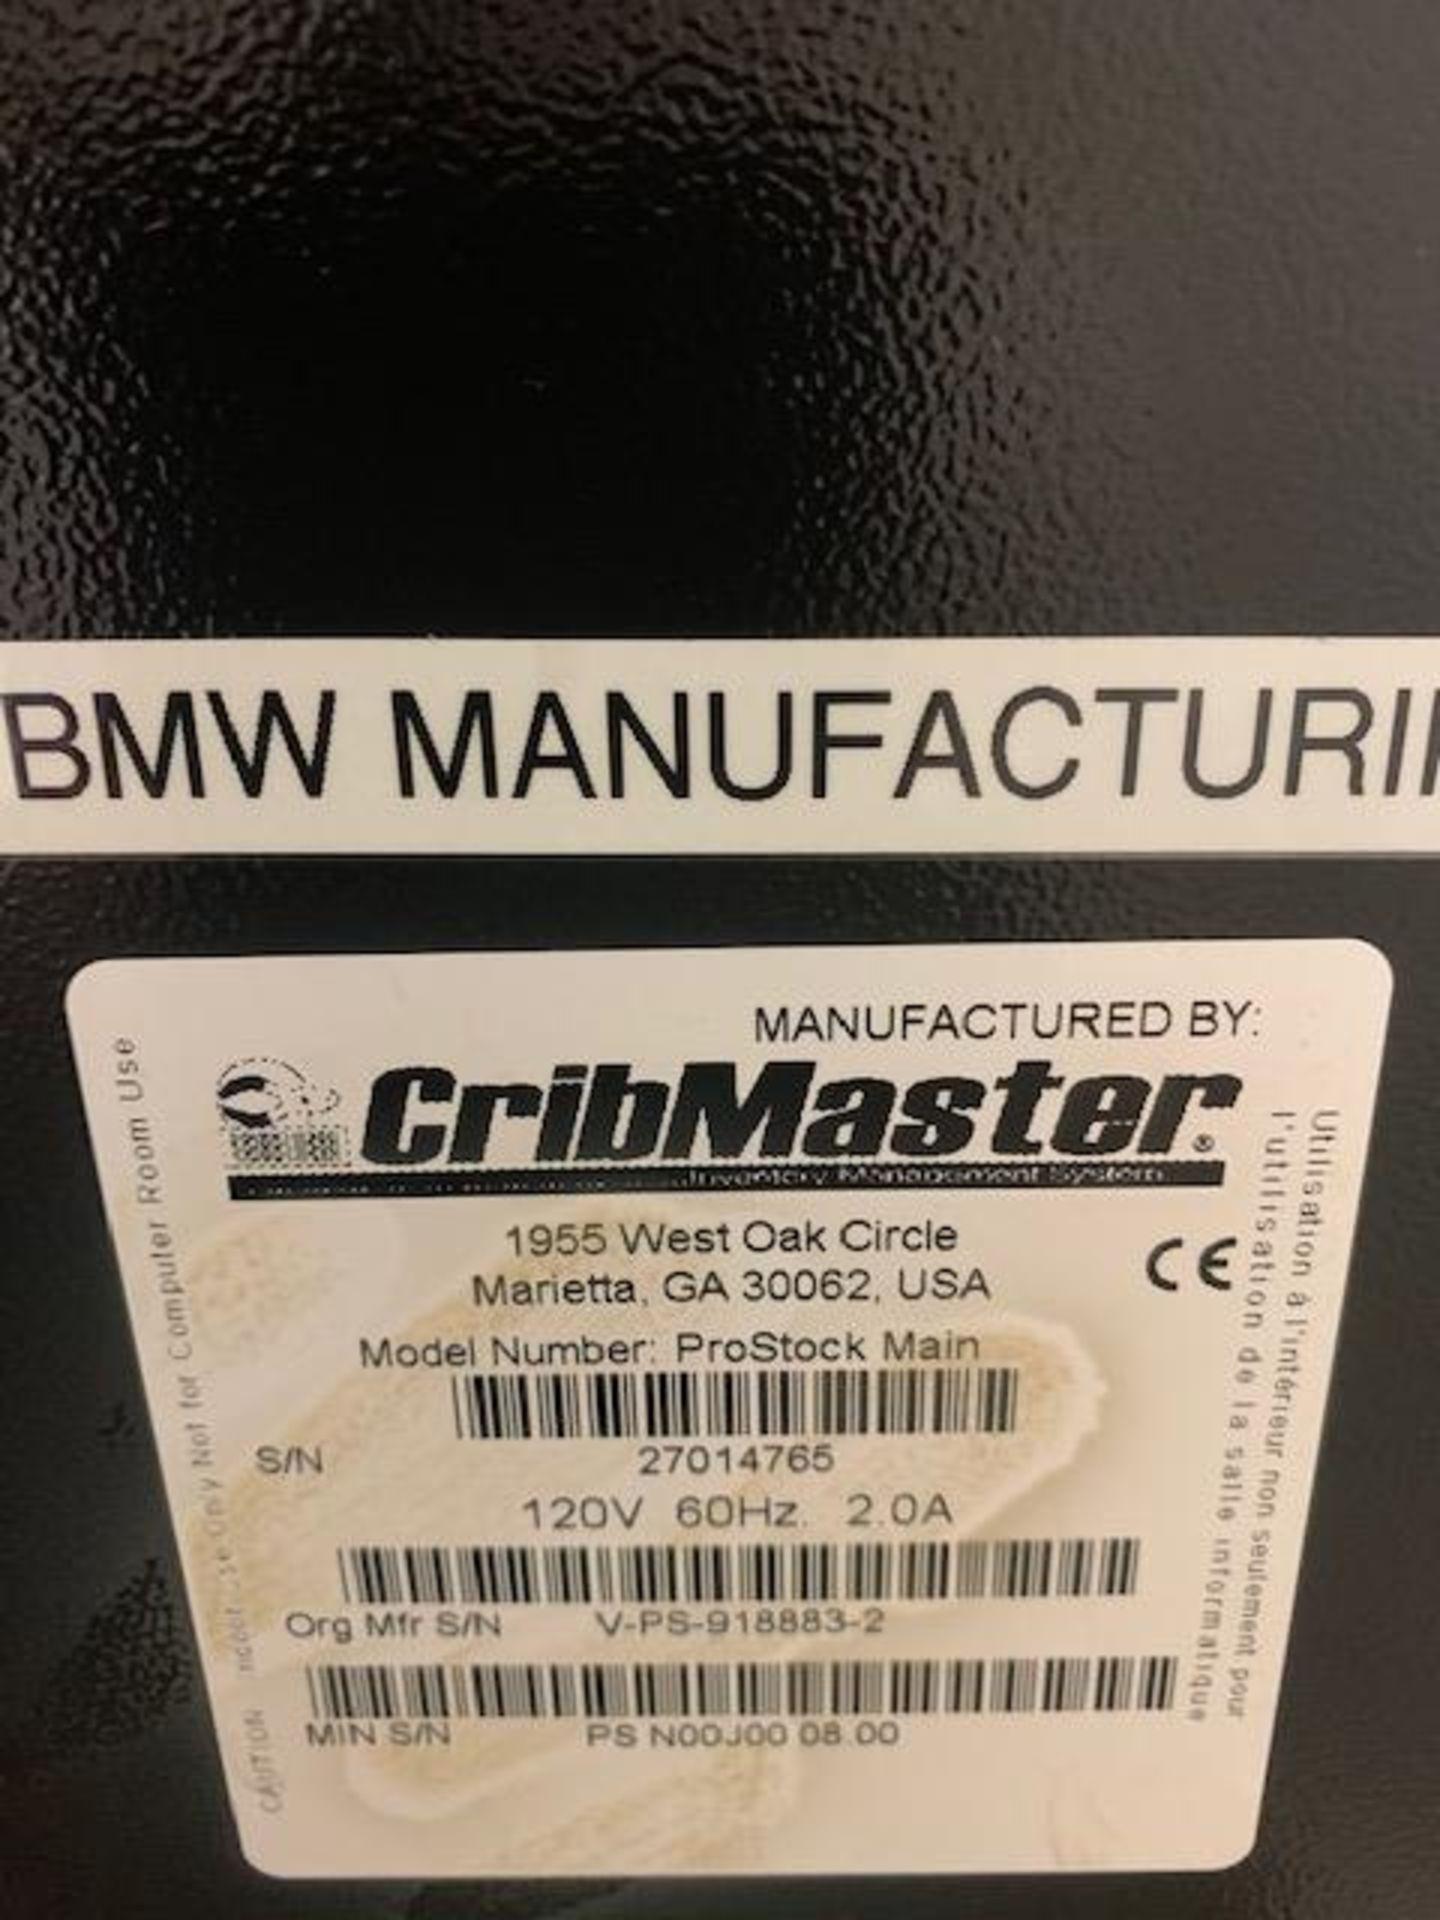 Cribmaster ProStock - Image 6 of 6